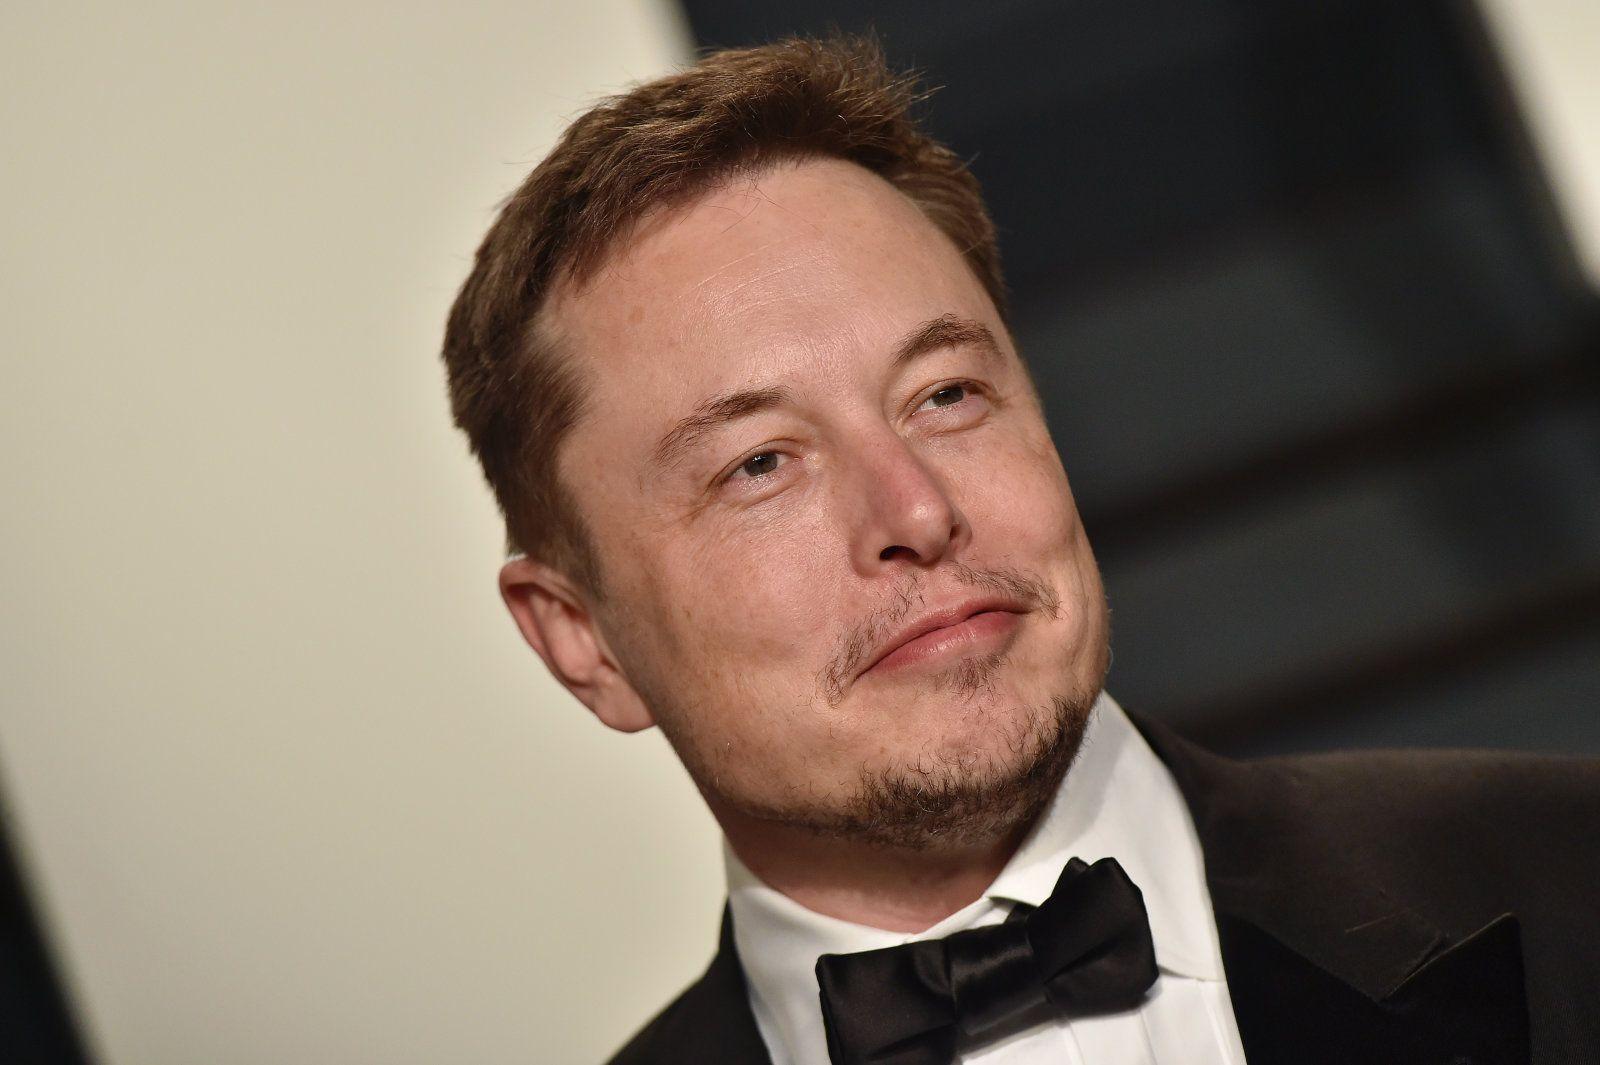 Elon Musk S Hyperloop Approval Seems To Be From The White House Elon Musk Elon Musk Hyperloop Musk